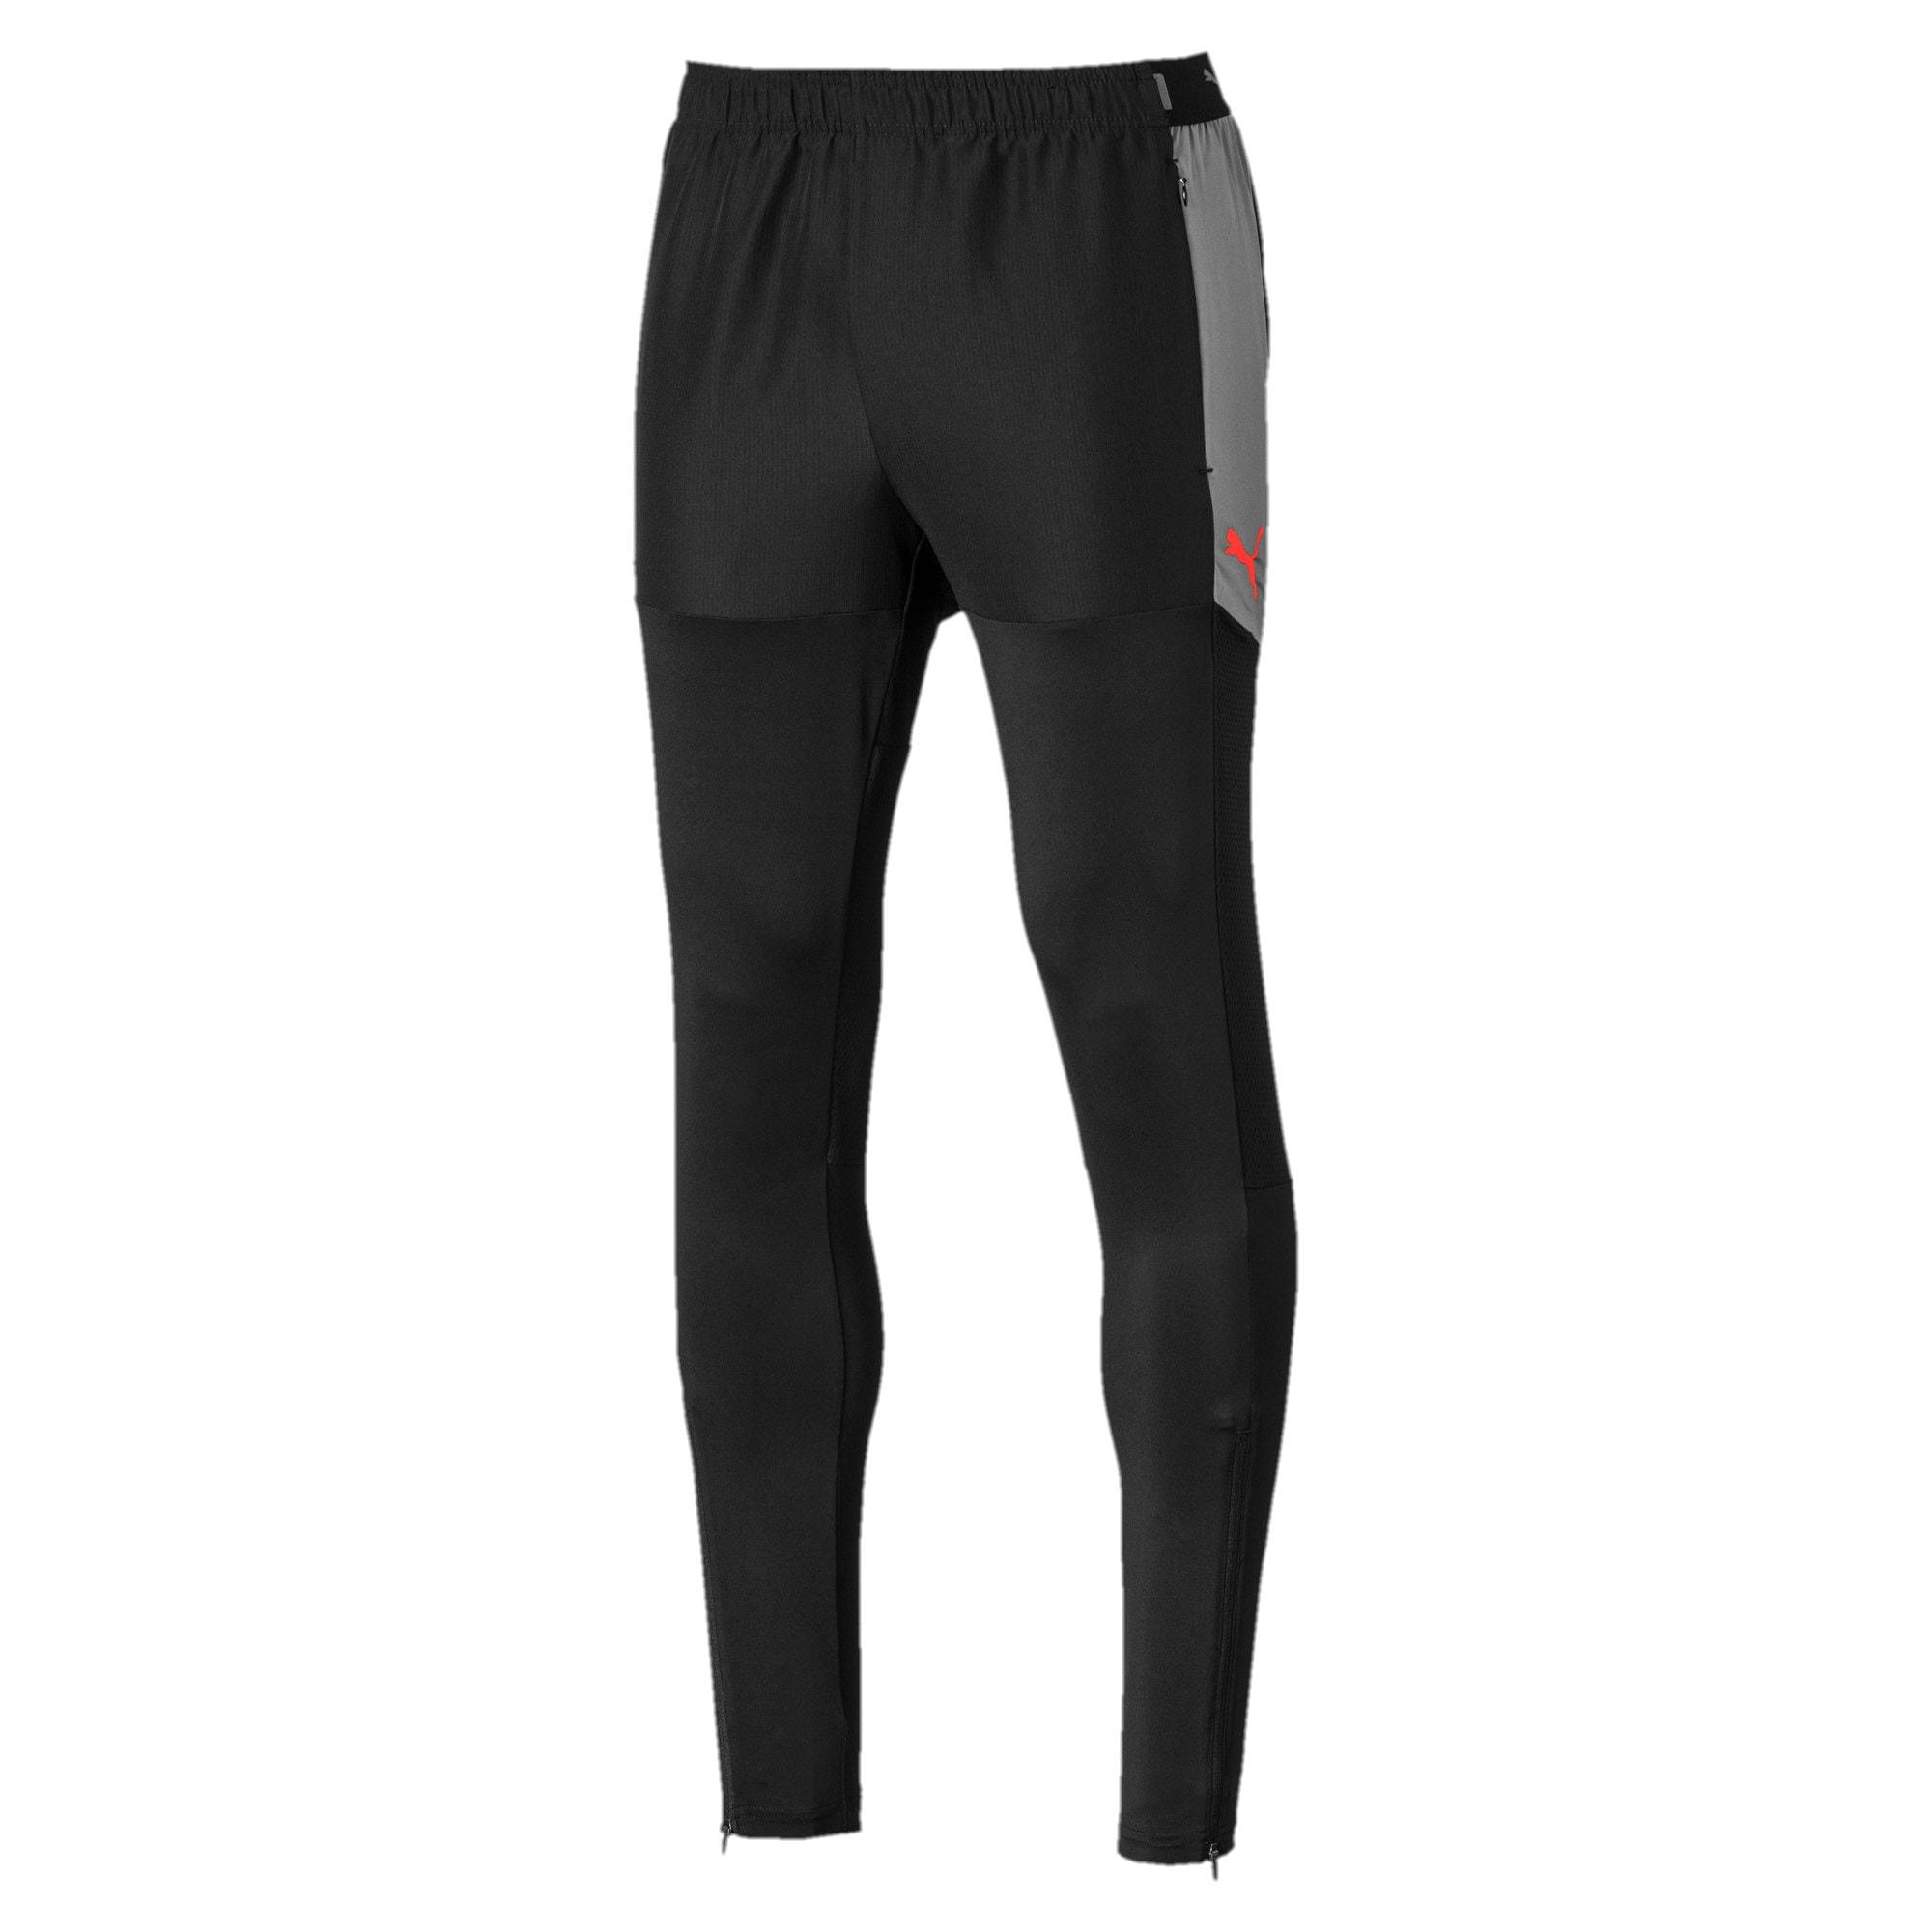 Thumbnail 4 of ftblNXT Men's Pro Pants, Puma Black-Nrgy Red, medium